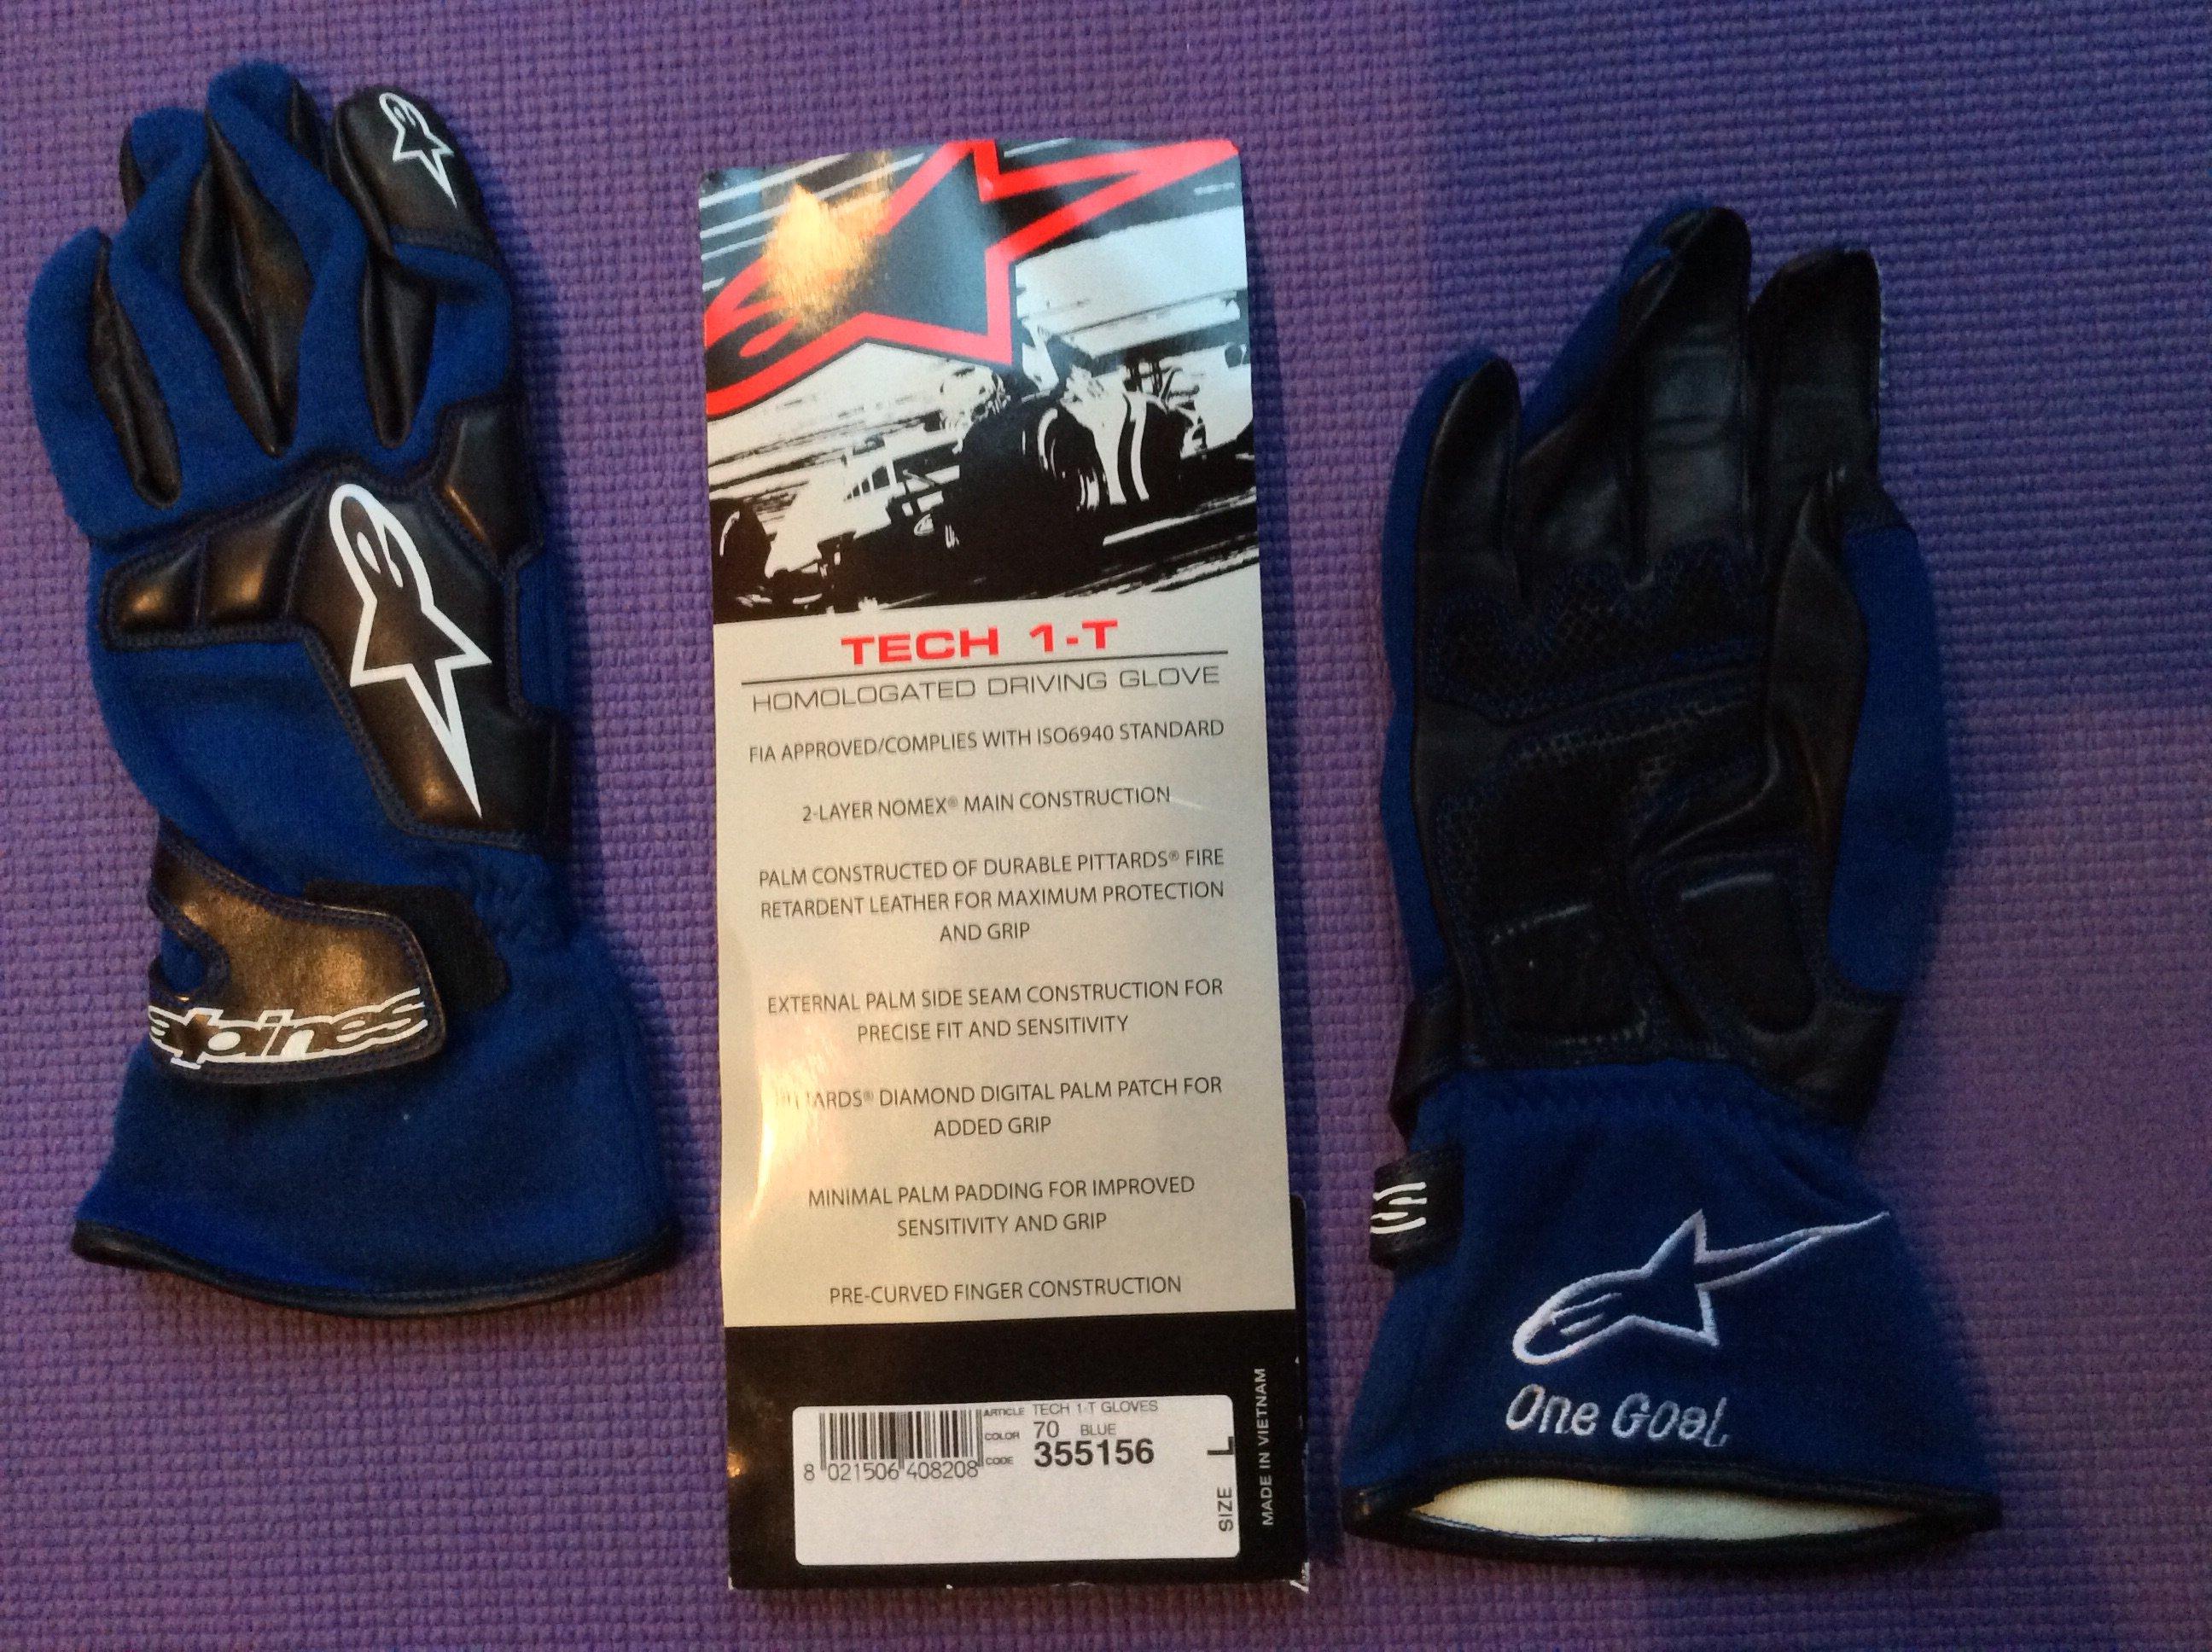 Driving gloves grip - Image Jpg